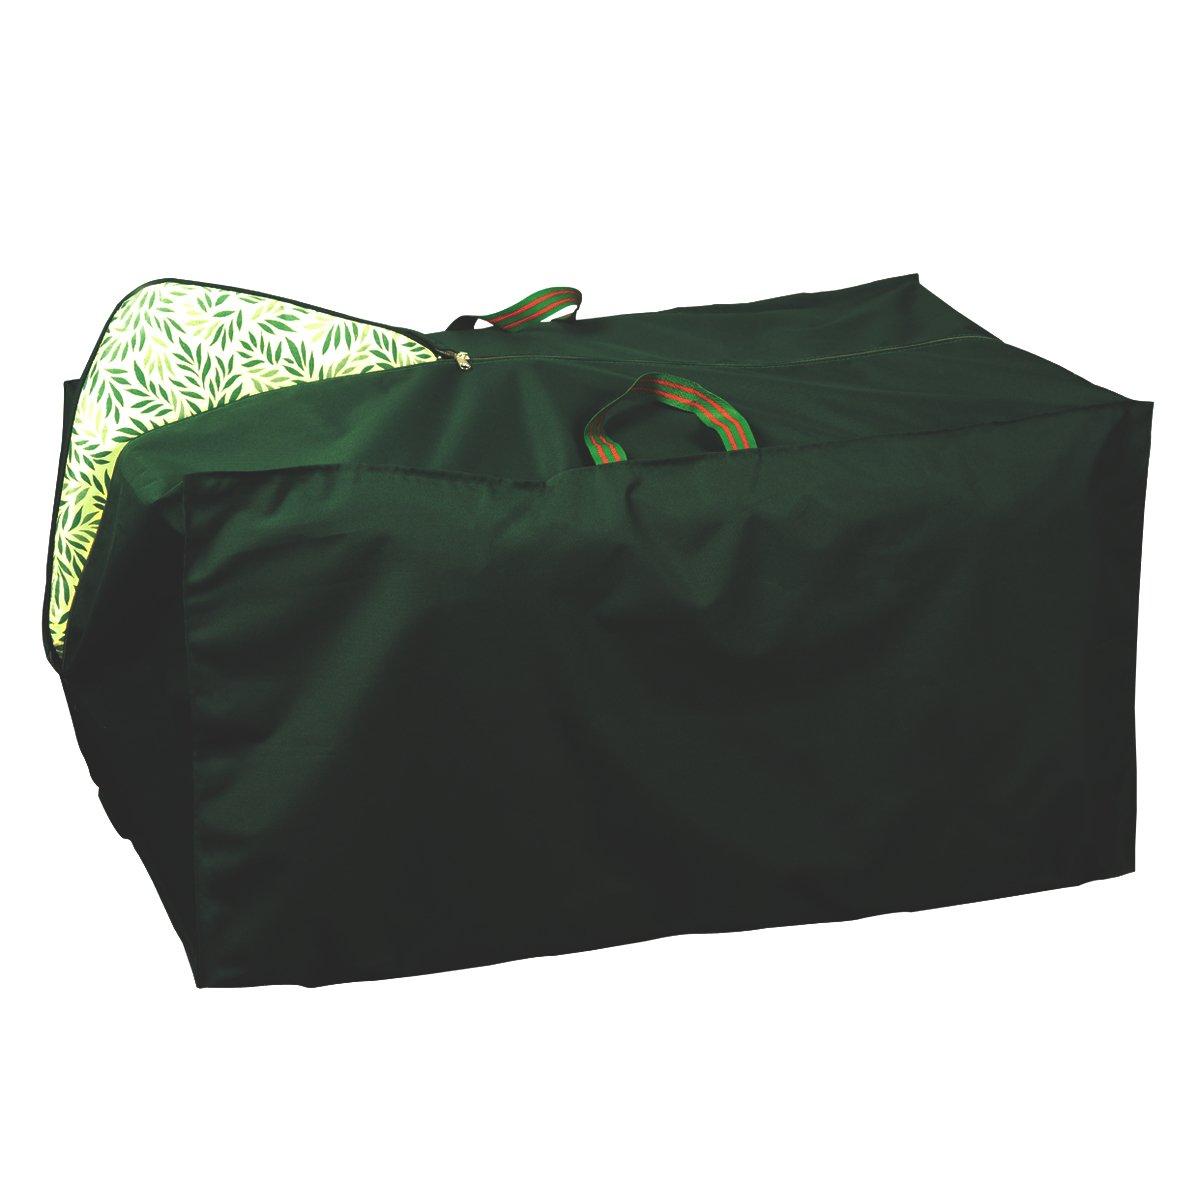 Bosmere C580 Premium Cushion Storage Bag: Amazon.co.uk: Garden U0026 Outdoors